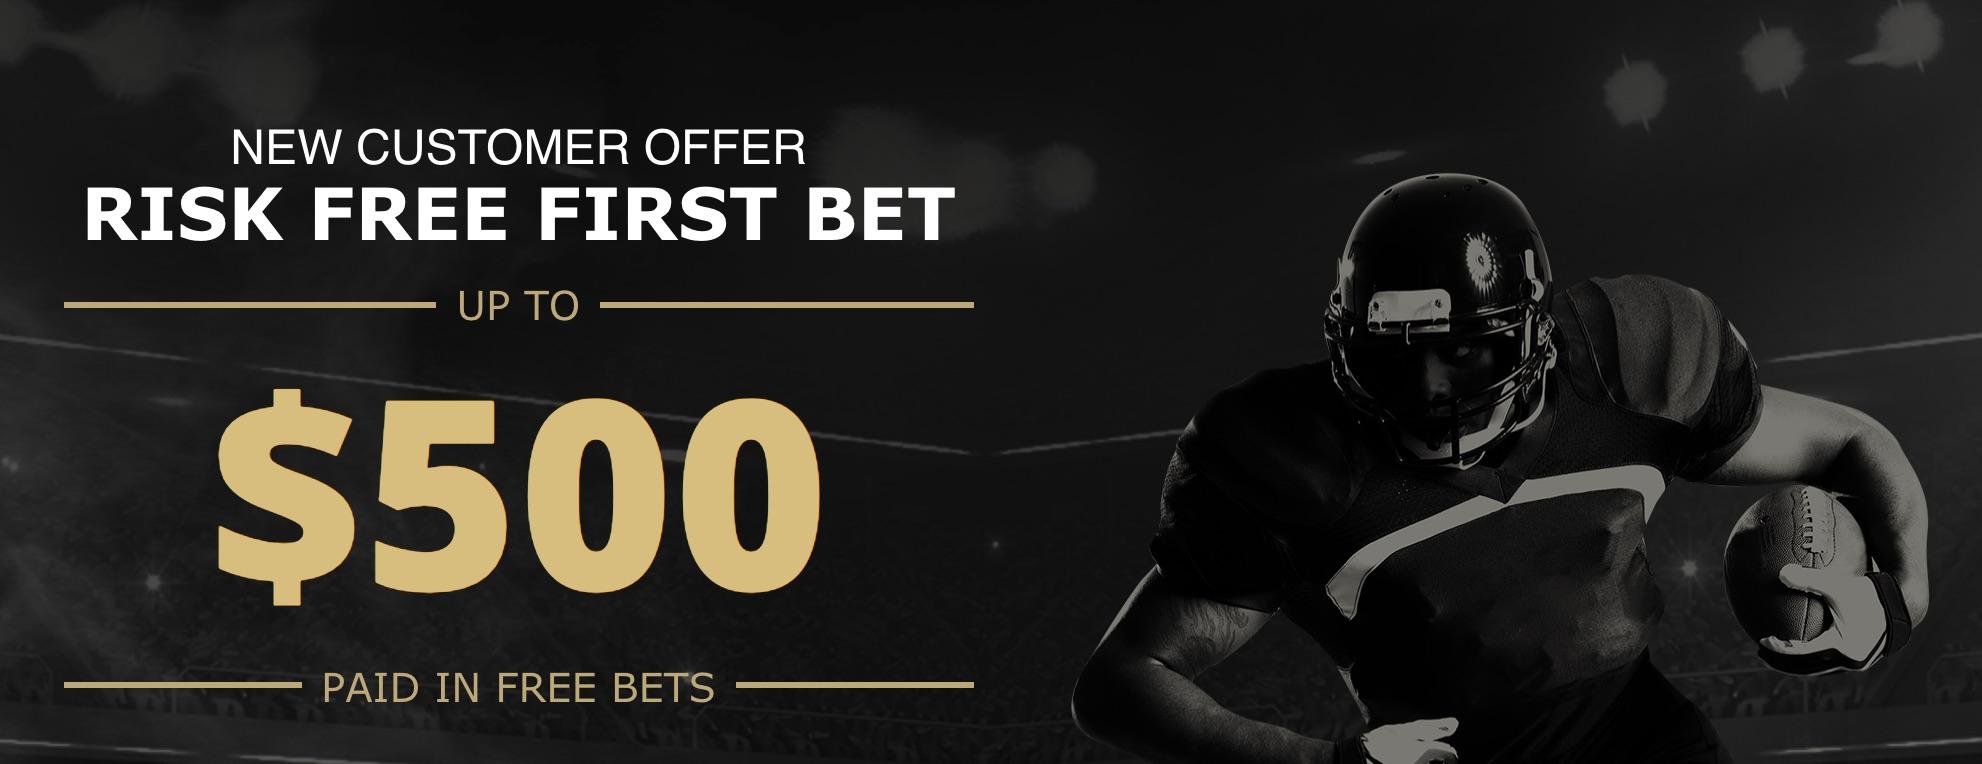 BetMGM $500 Risk Free Bonus Bet